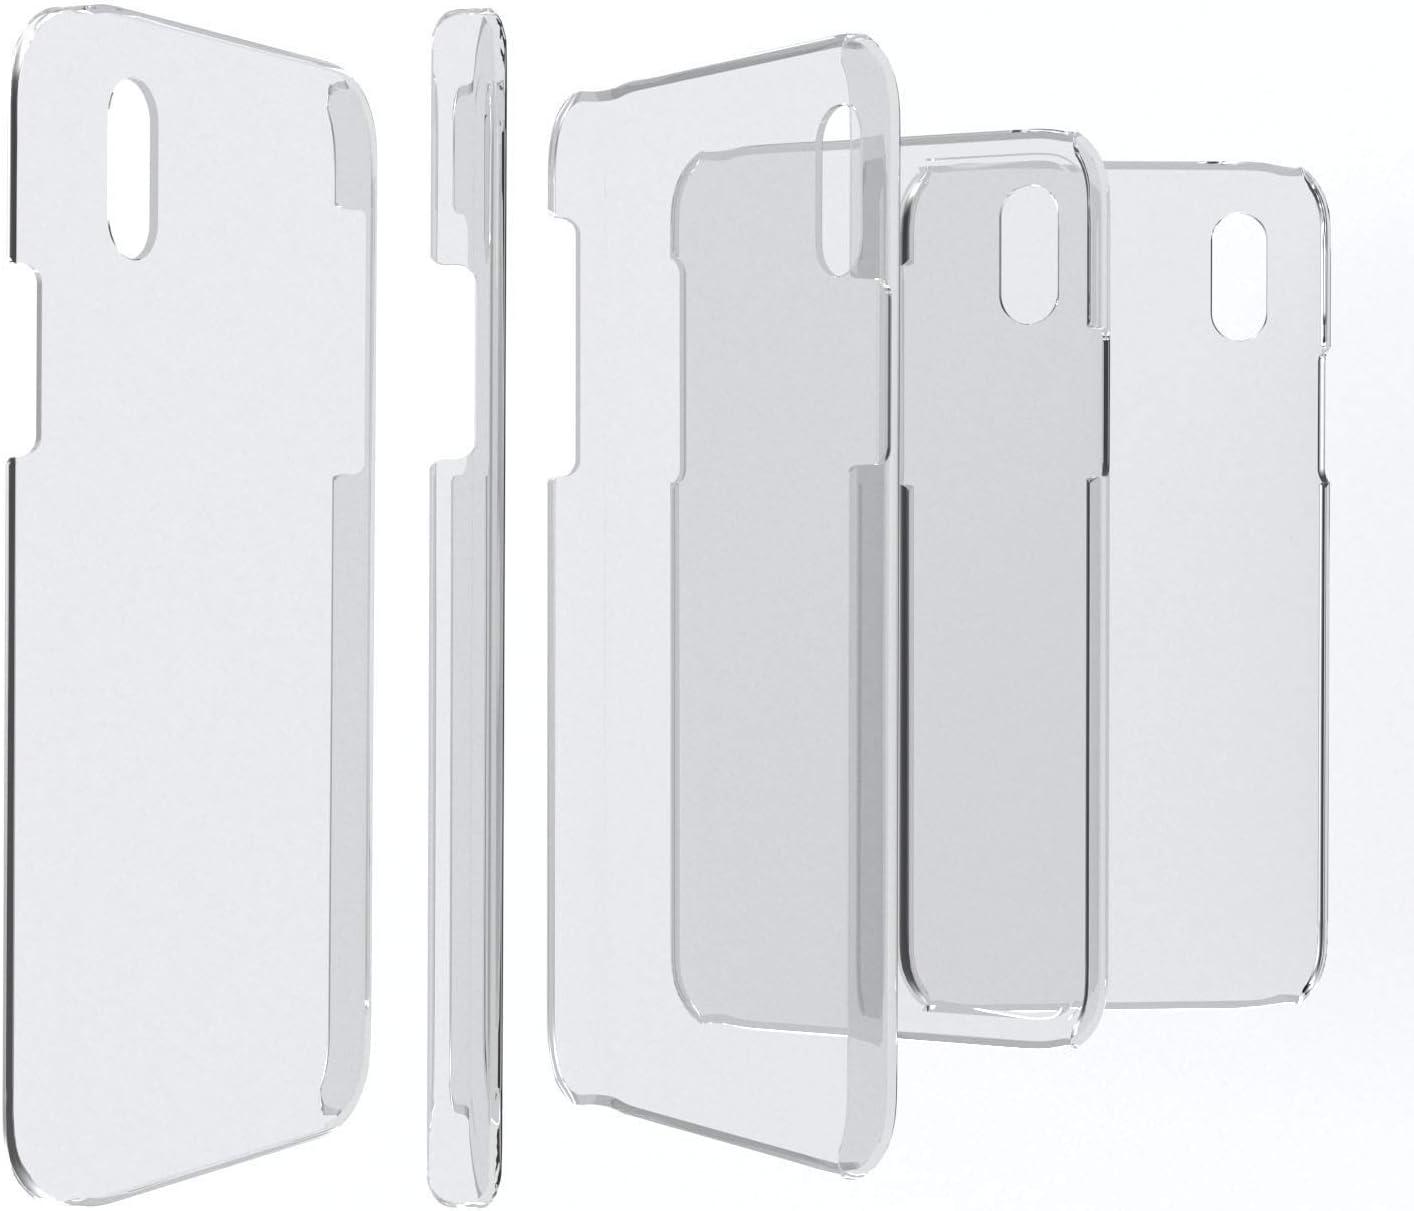 Keyscaper KCLRXR-0TEN-PAISL1 Tennessee Volunteers iPhone XR Clear Case with UT Paisley Design